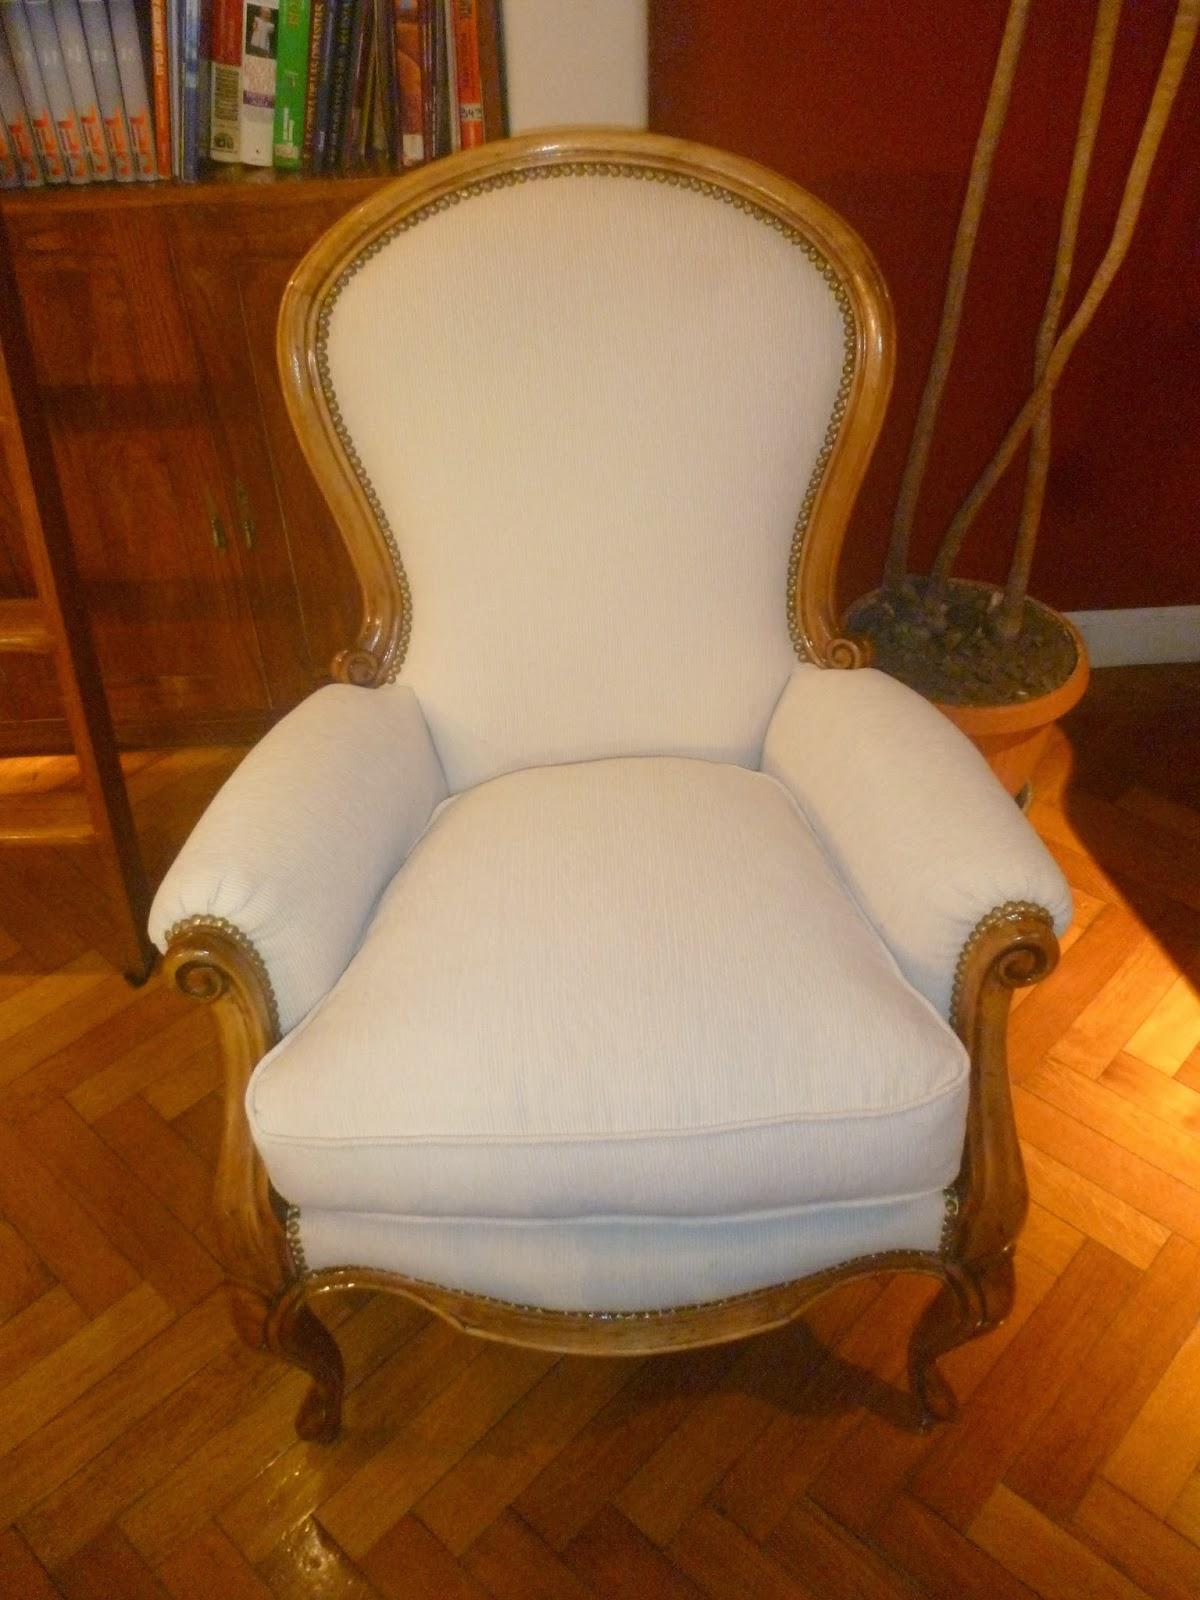 El motivo antig edades restauraci n de sillones de estilo for Sillones clasicos ingleses